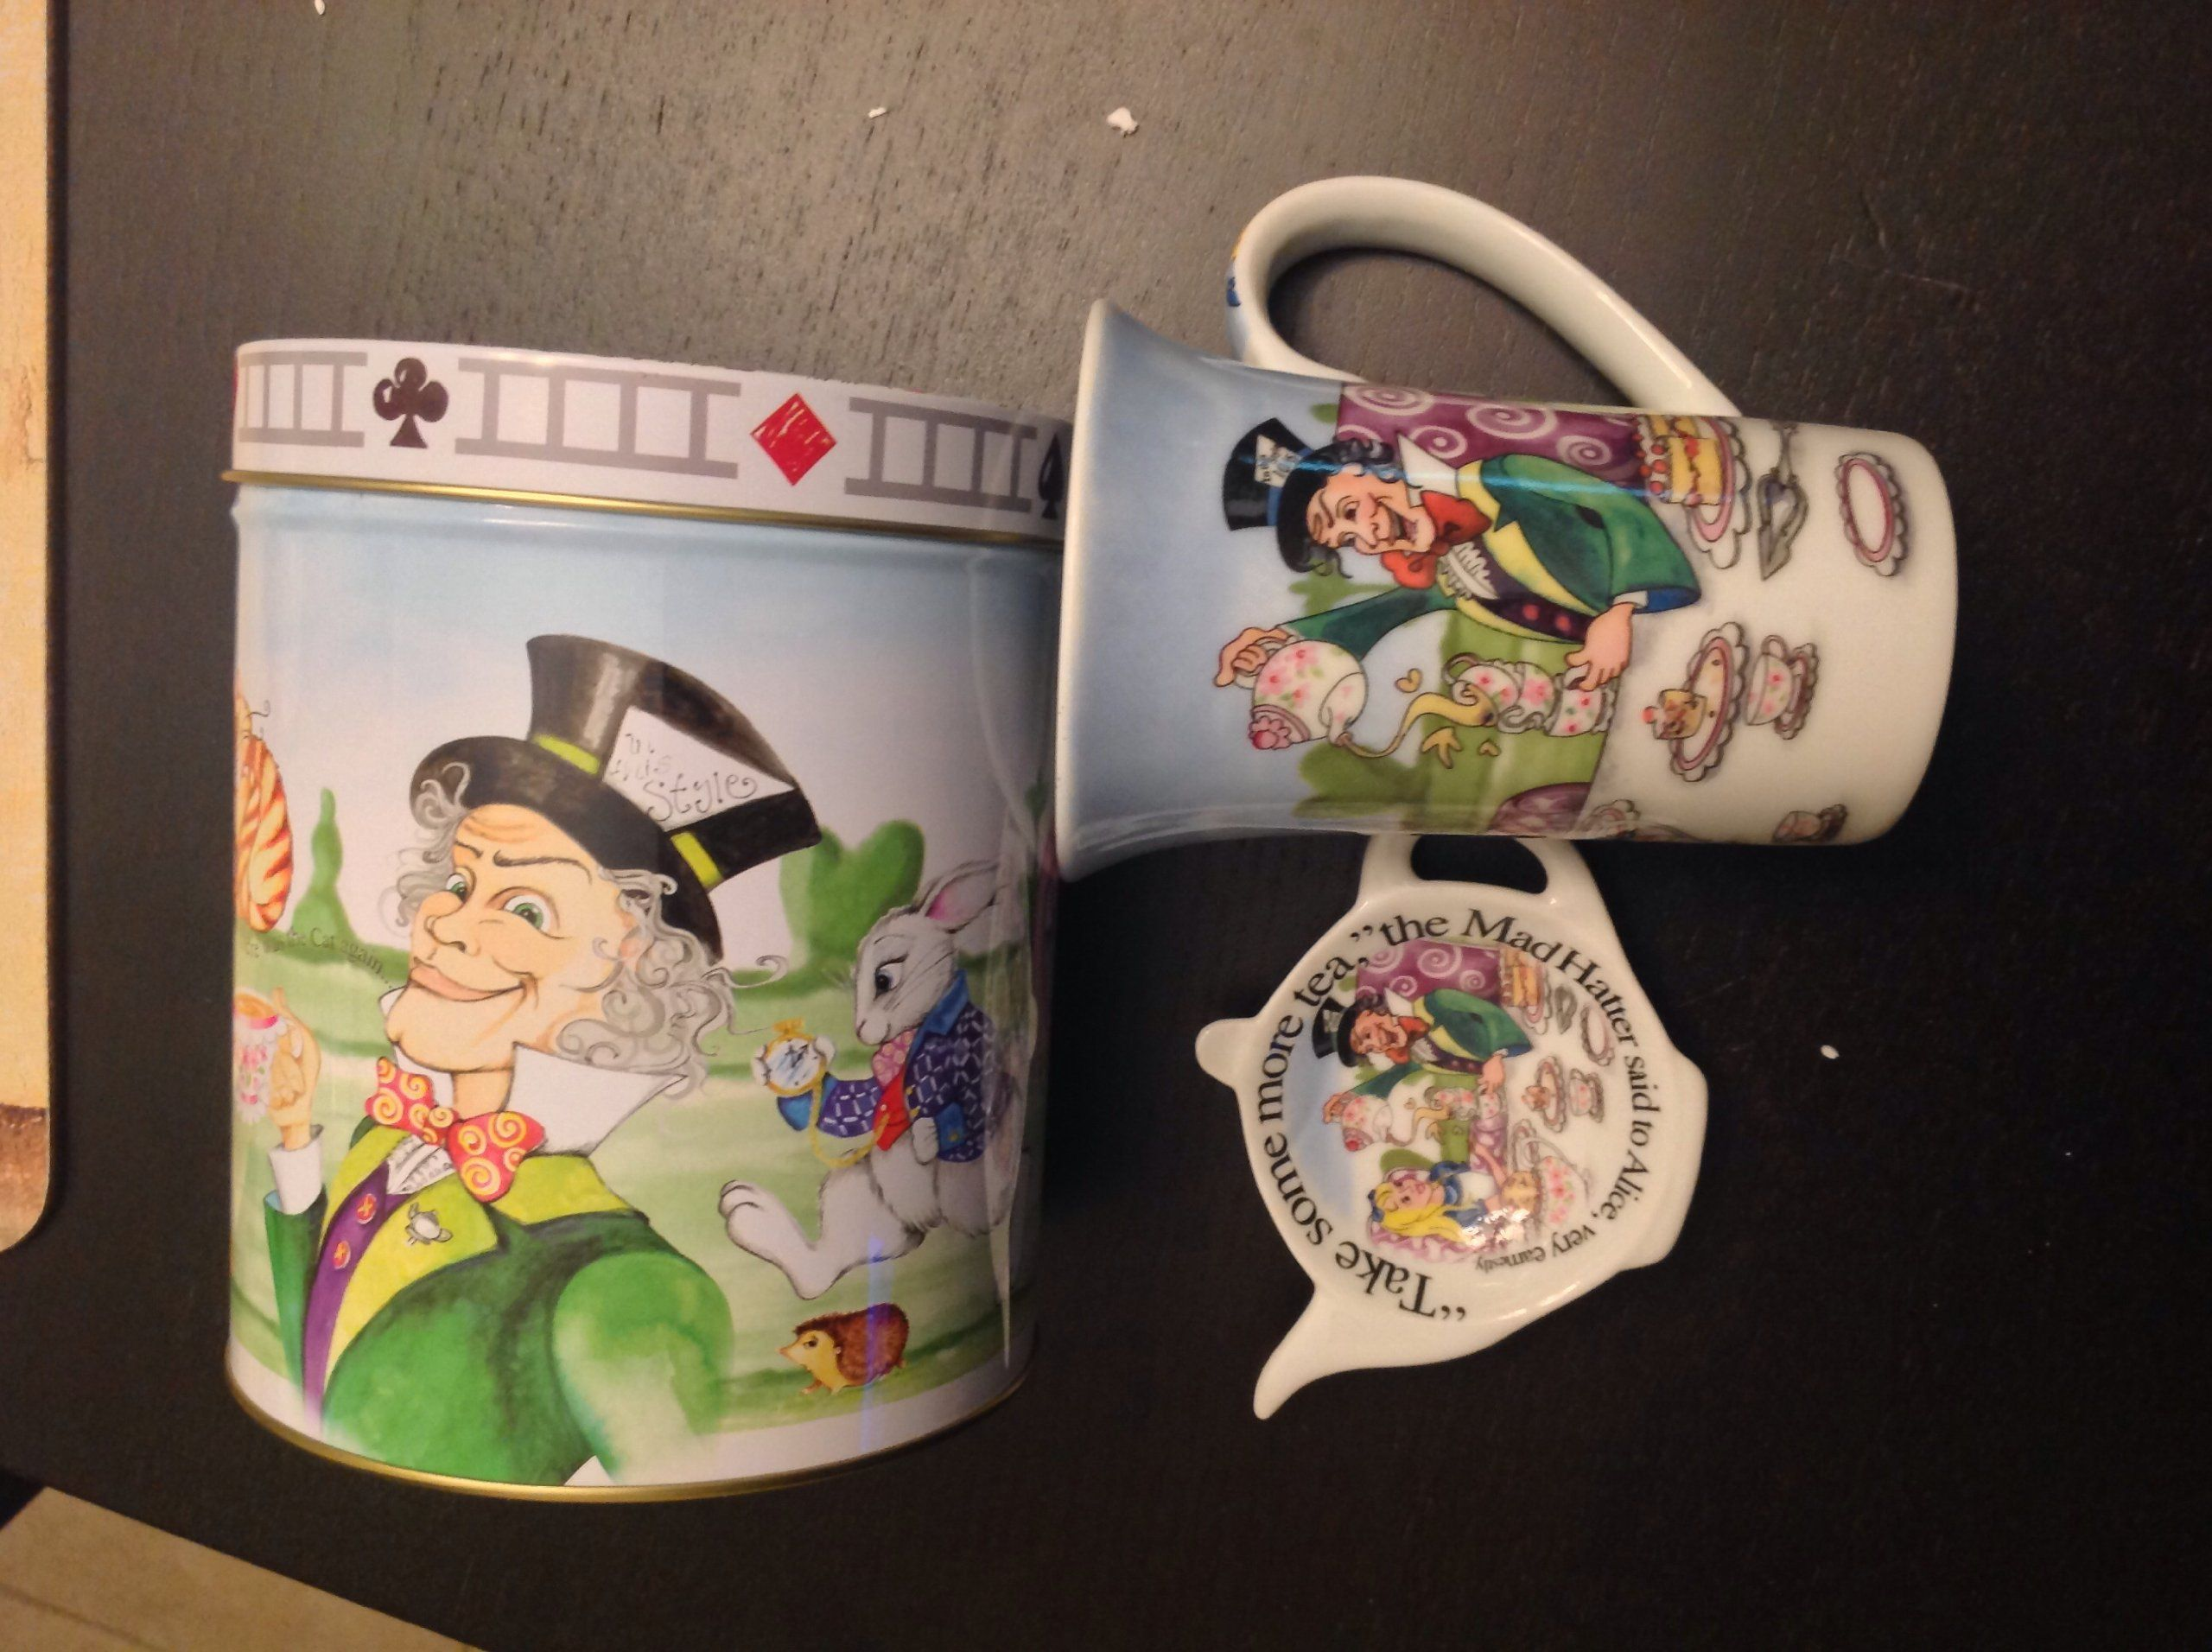 Amazon.com: Paul Cardew Alice in Wonderland Mug, Coaster & Tin: Home & Kitchen